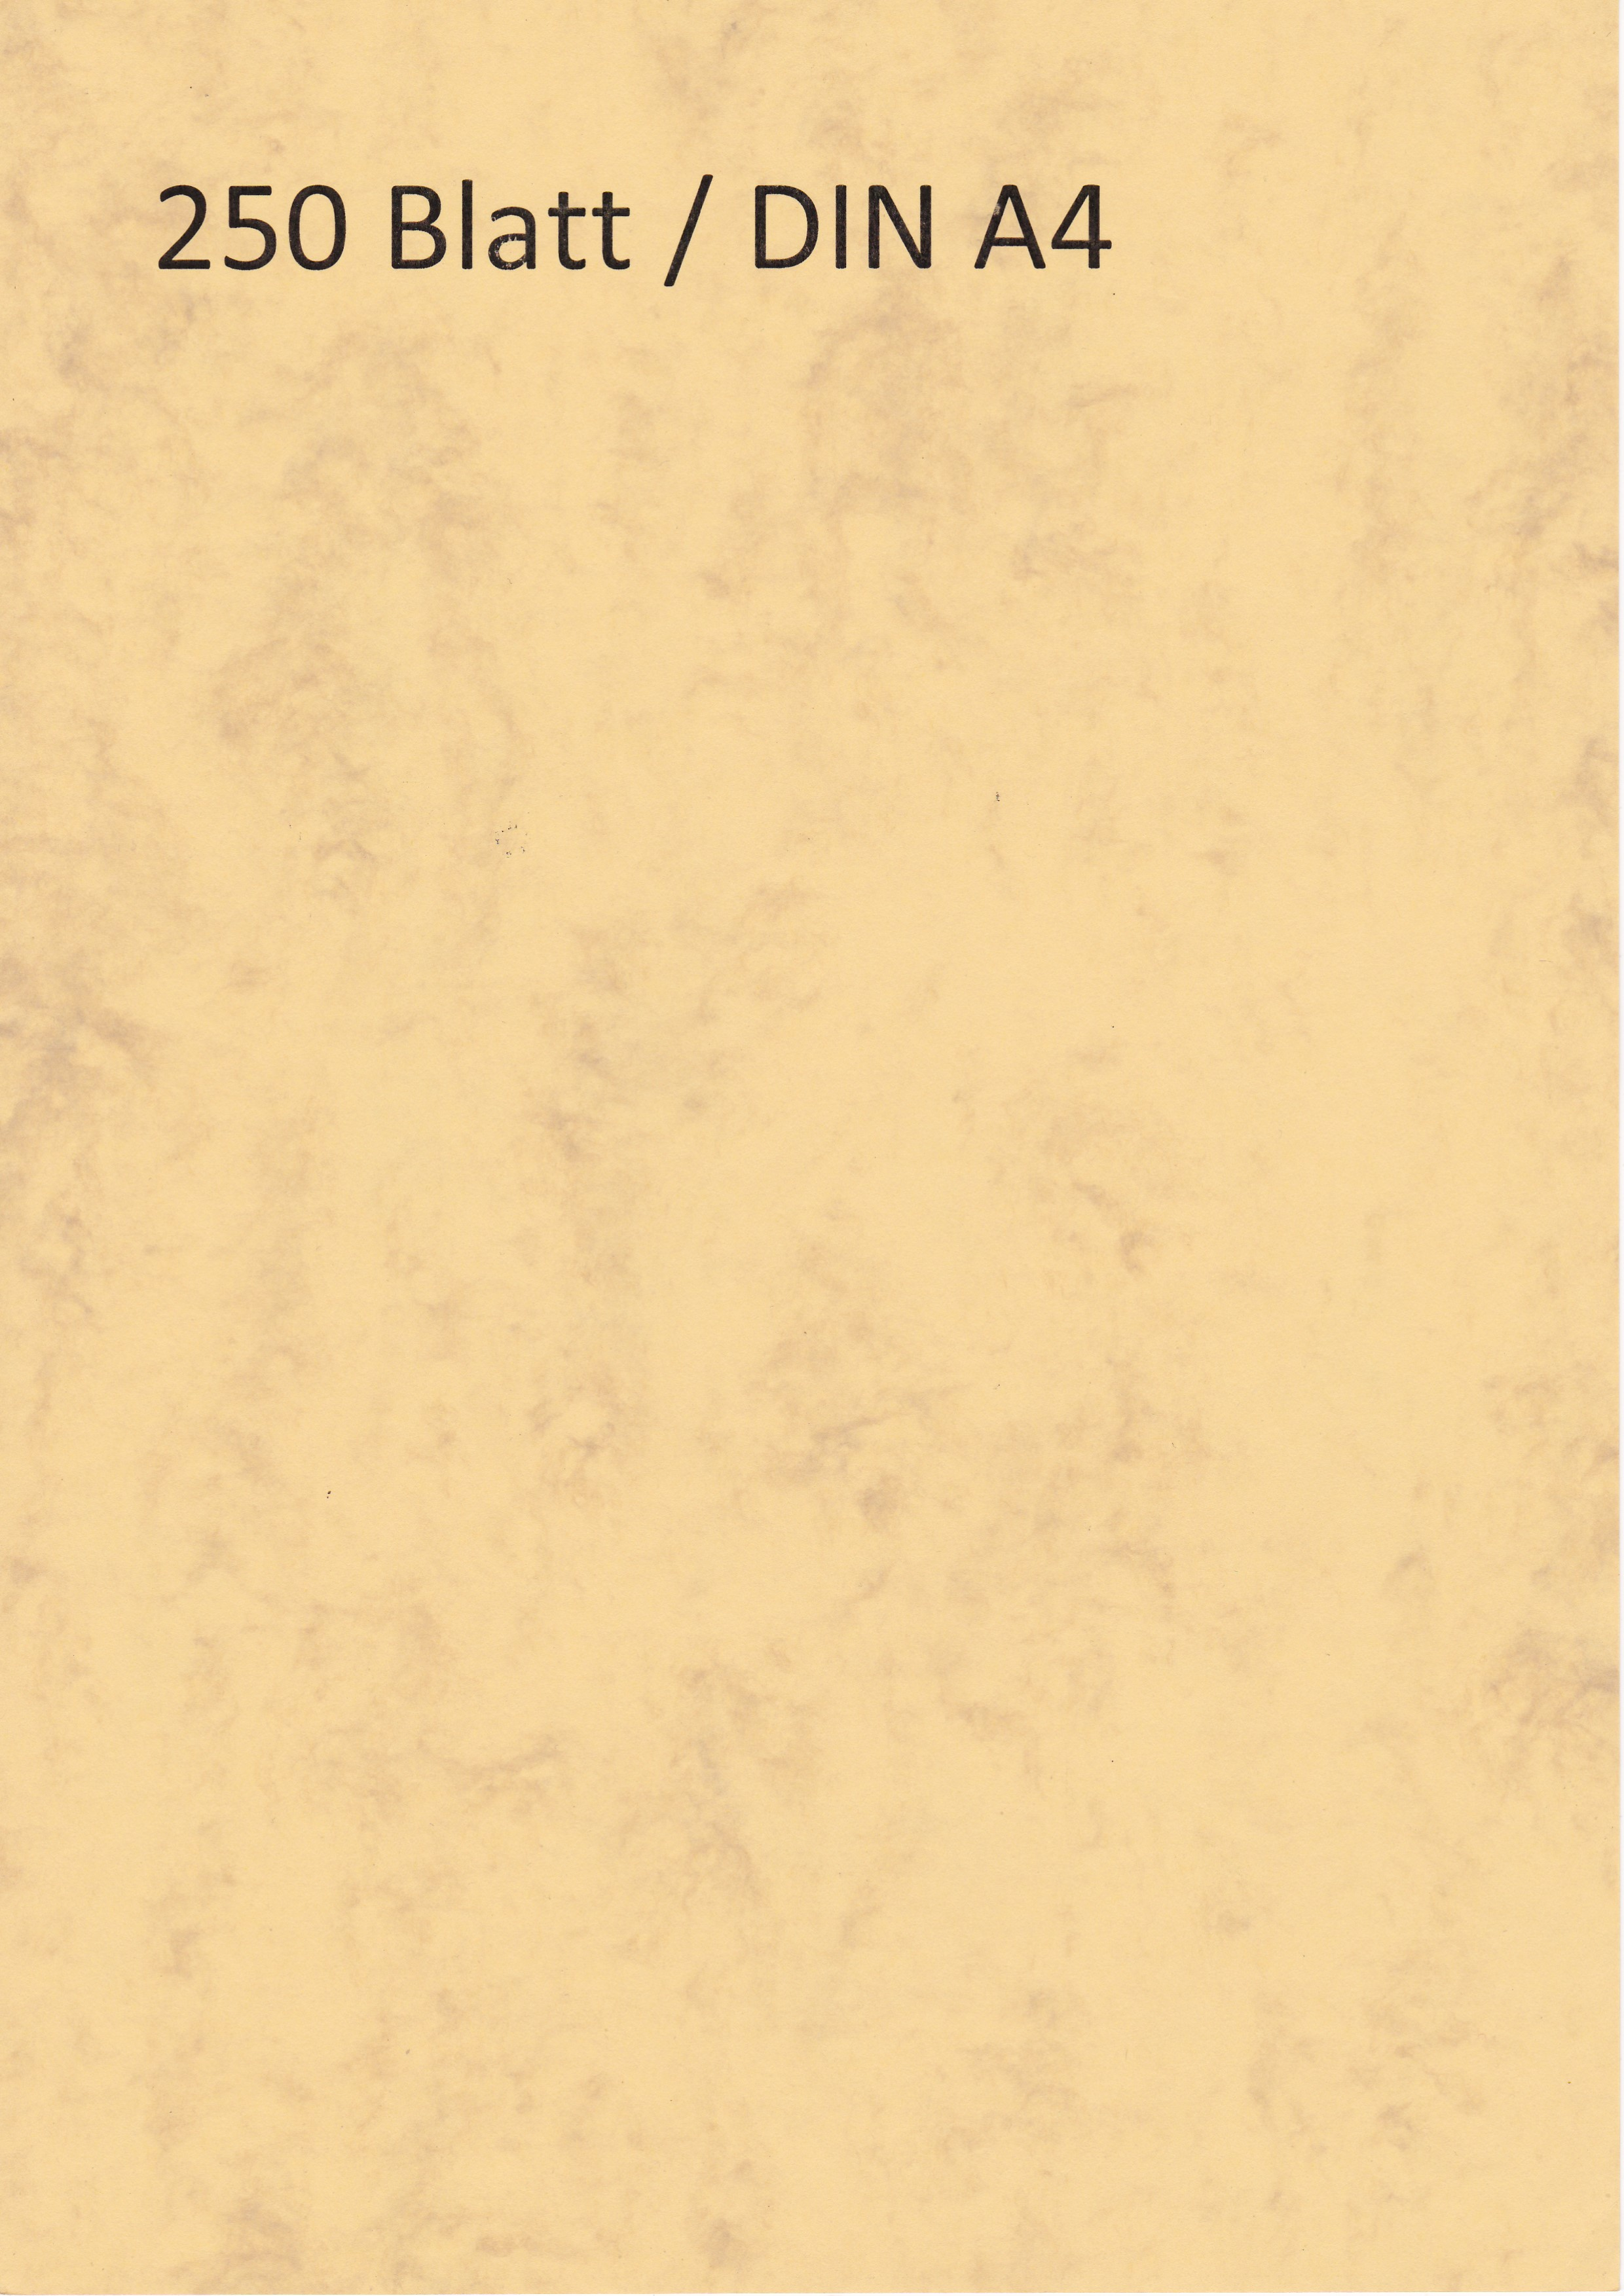 Marmorpapier A4 170g m² 50 Blatt grün